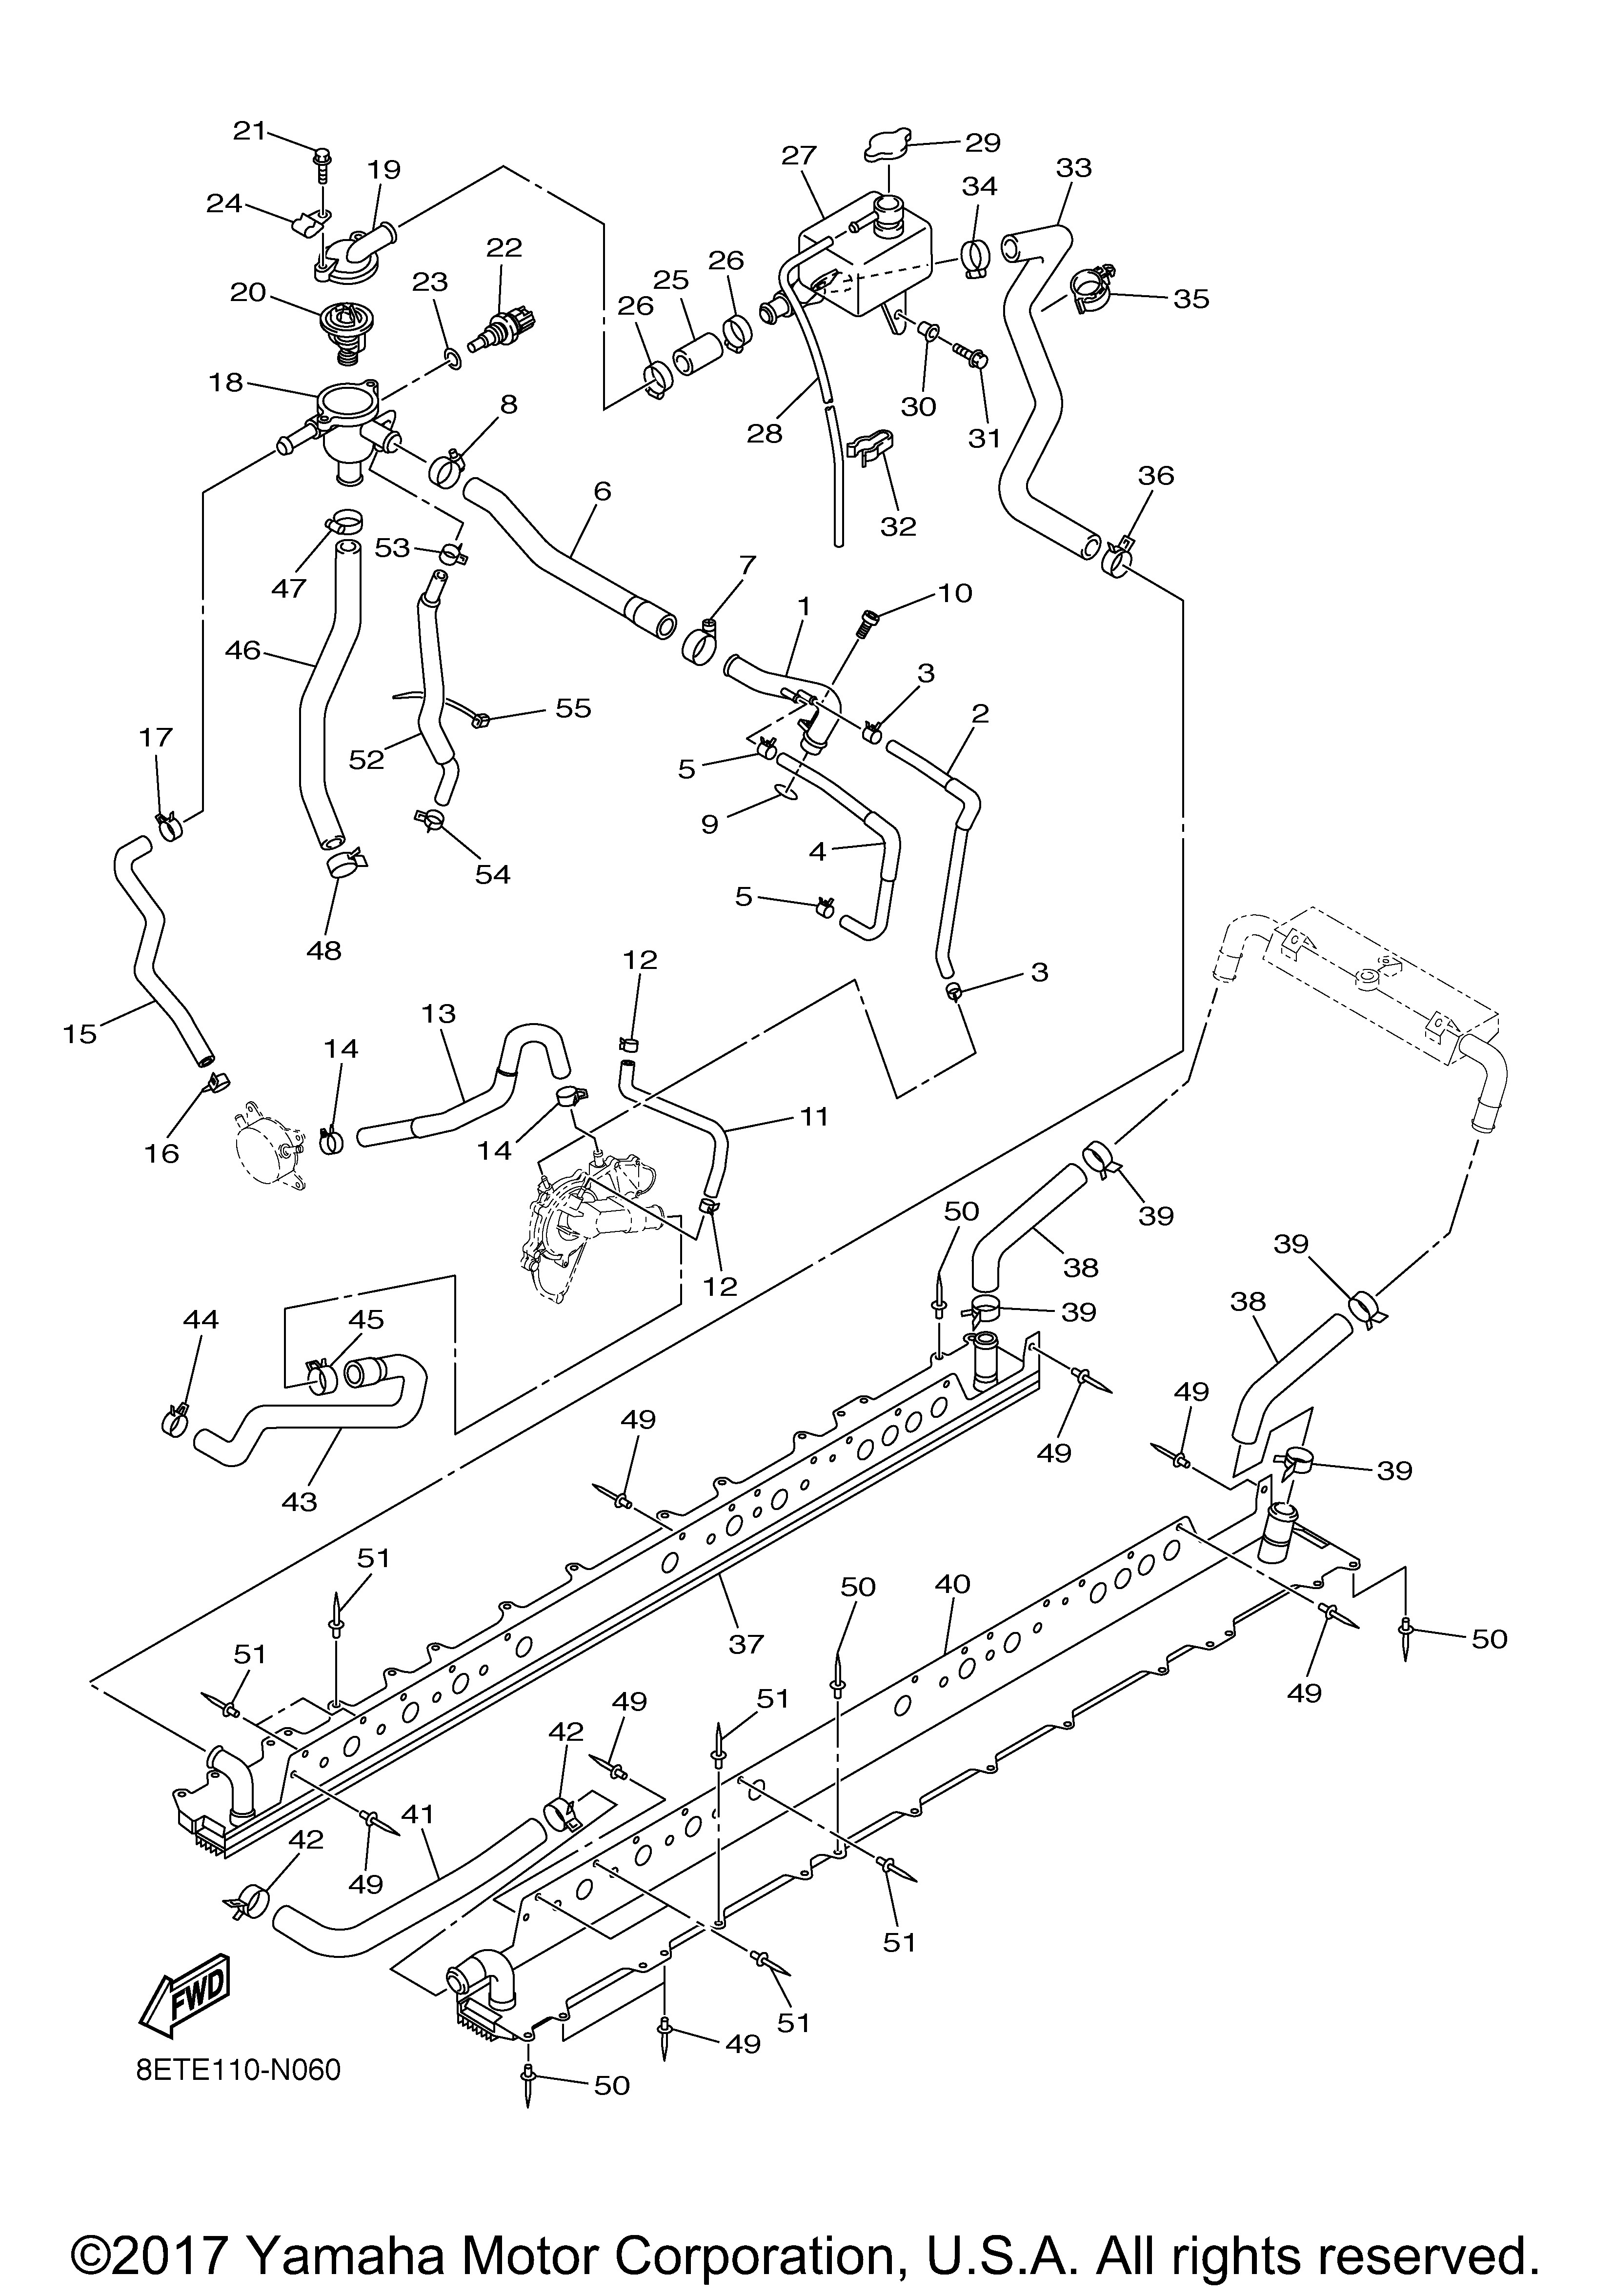 Yamaha OEM Part 8FA-17645-10-00